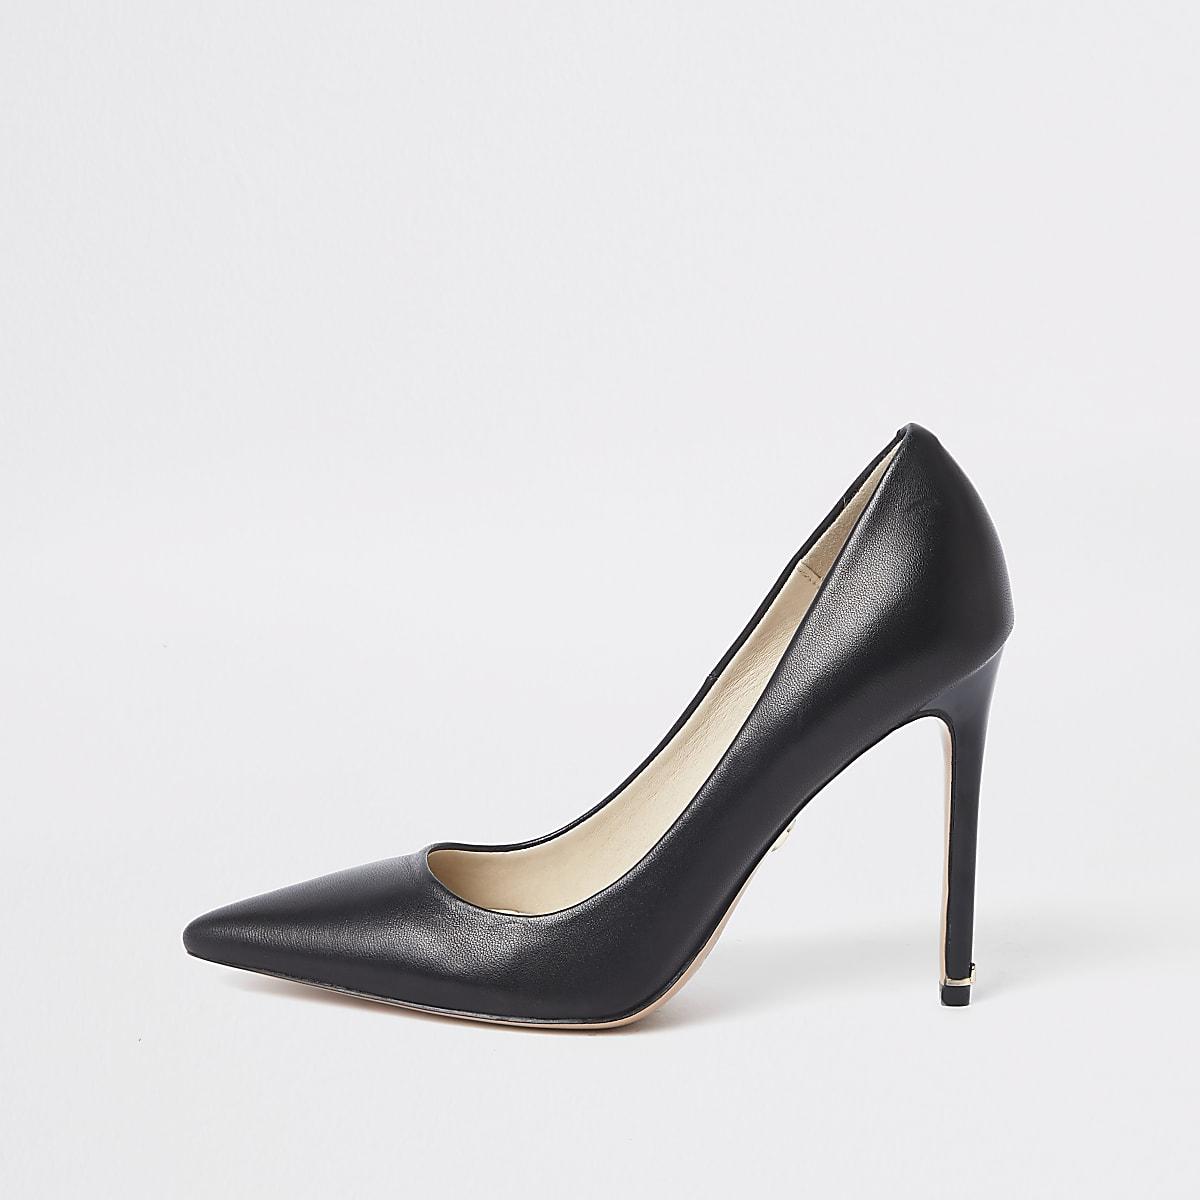 Cuir Escarpins Bottes Femme En Noir Chaussuresamp; NmnvO08w